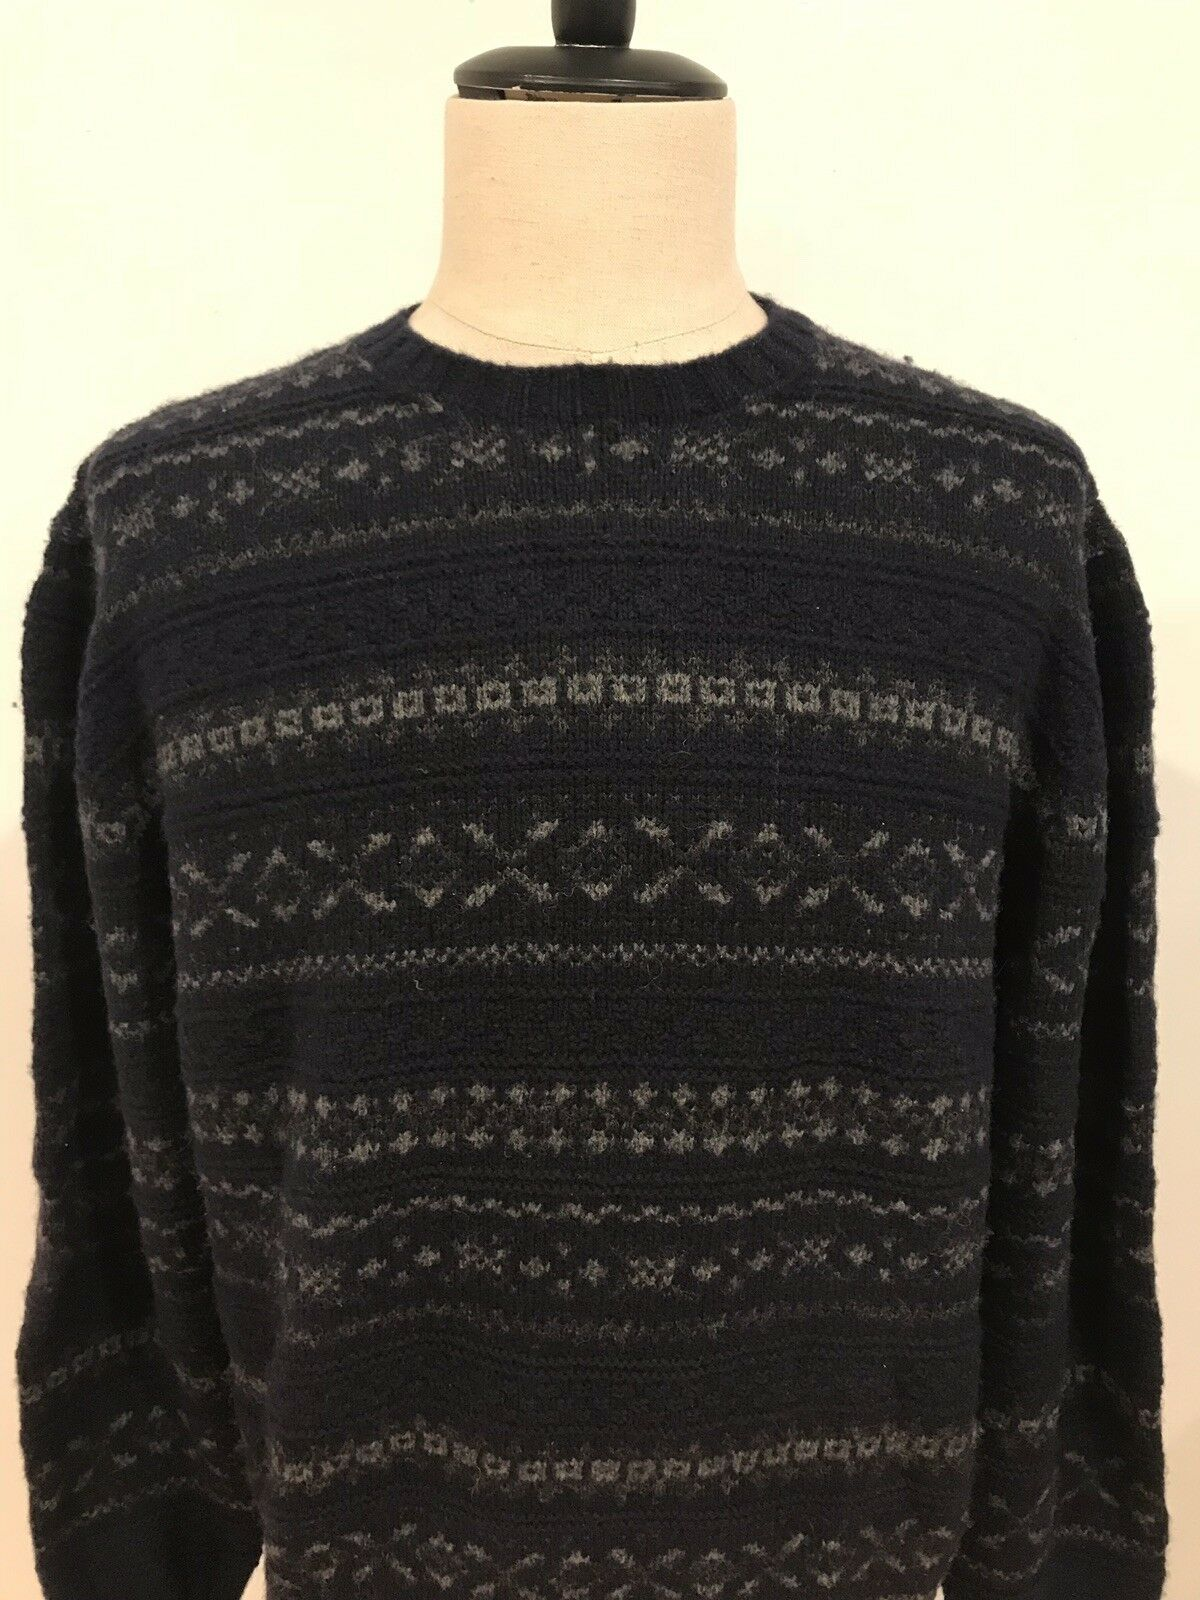 Ralph Lauren Mens 100% Lambswool Handknit Fair Isle Sweater Size Large